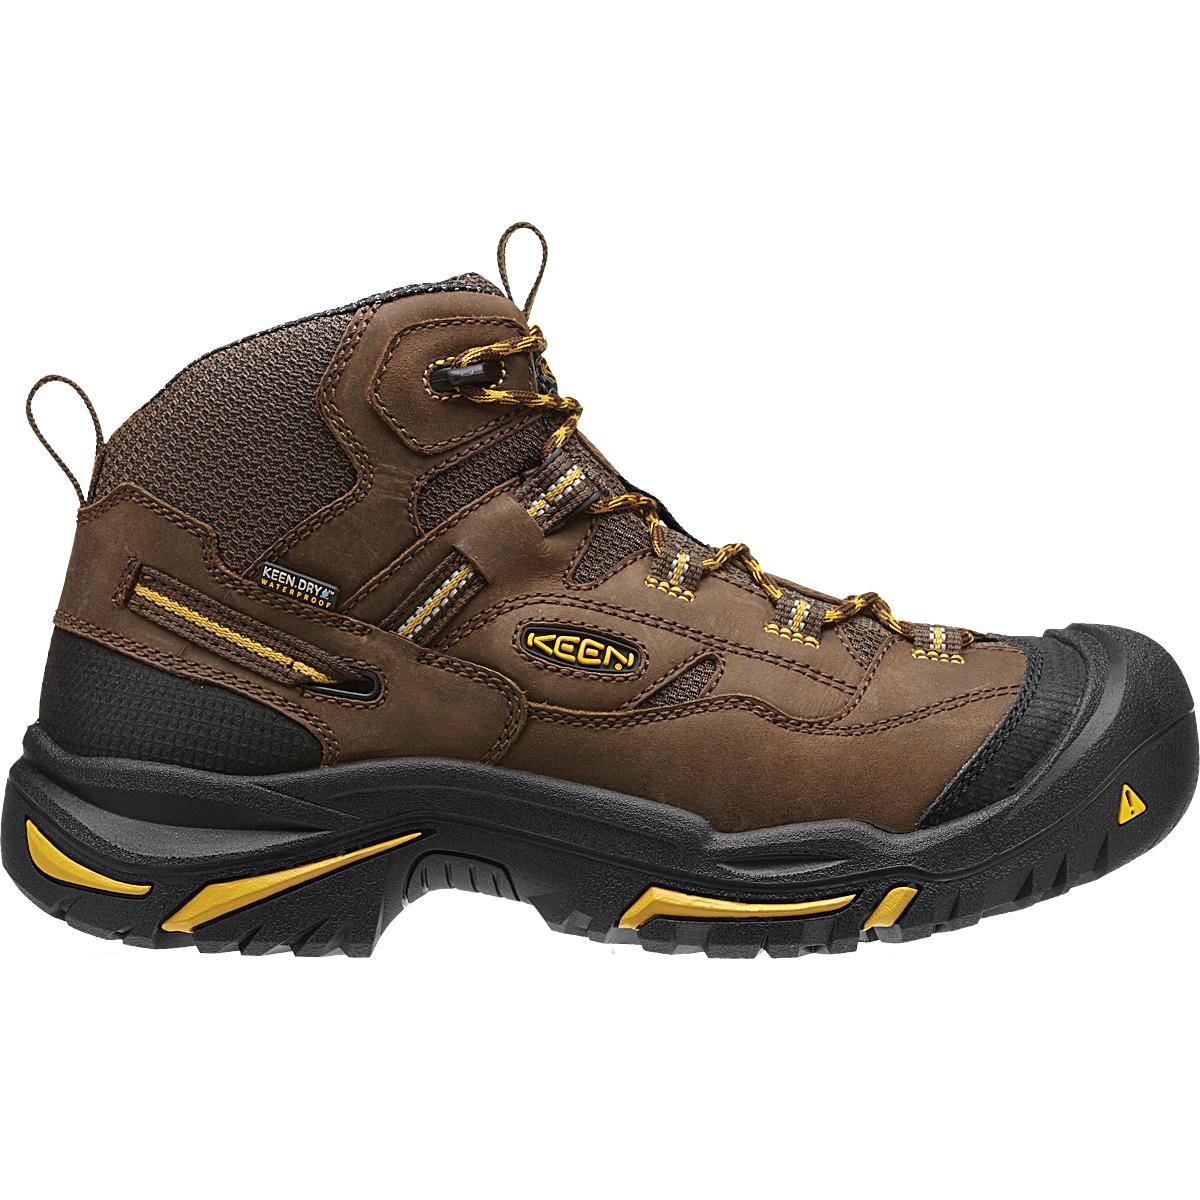 6c9ff145758 KEEN Utility Braddock Men's Steel Toe EH Waterproof Hiker